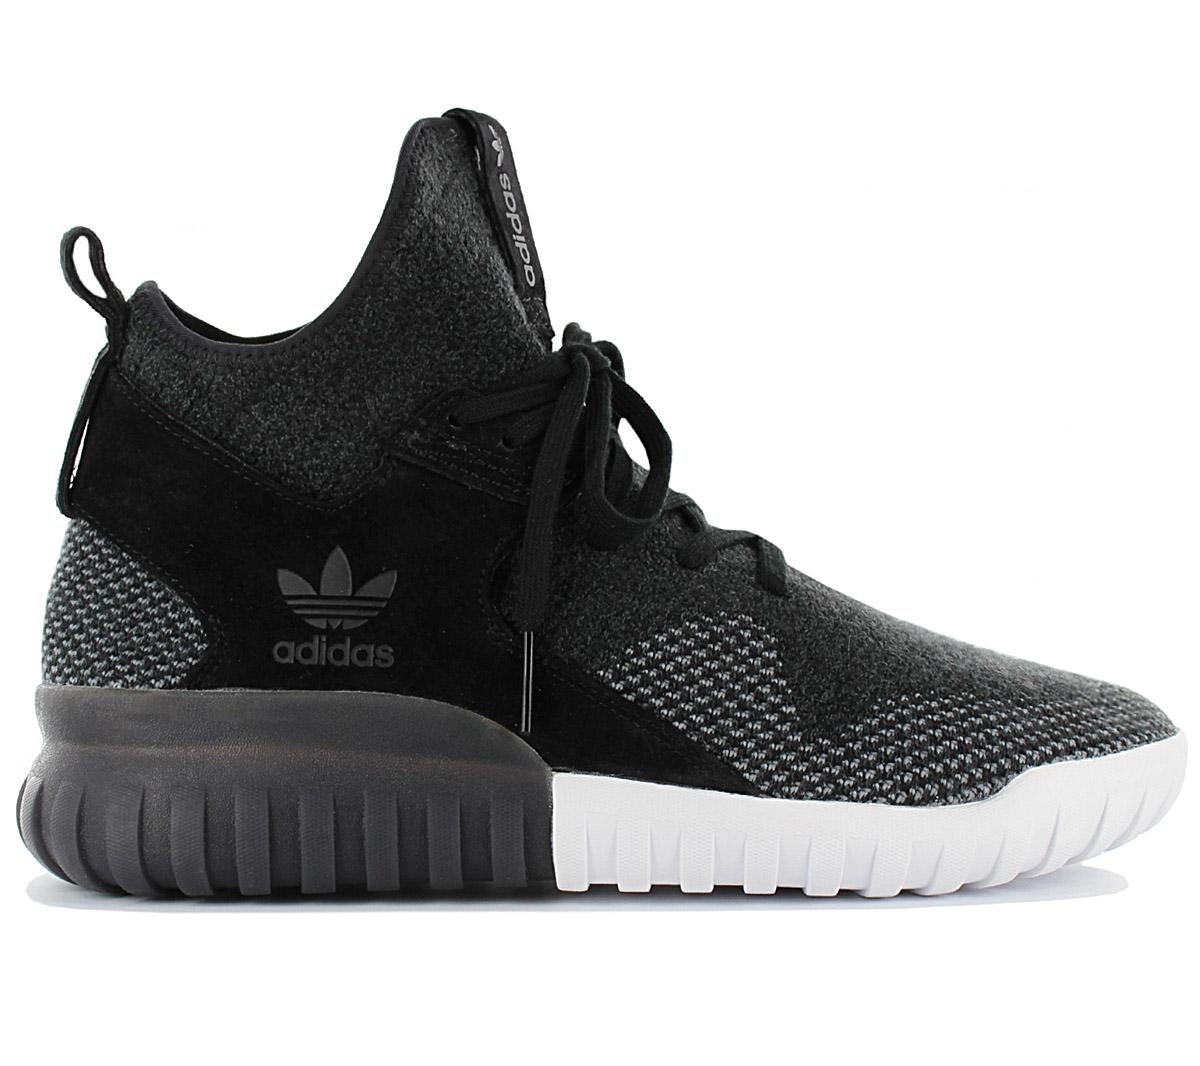 Details zu adidas Originals Tubular X PK Primeknit Herren Sneaker BB2379 Schuhe Turnschuhe